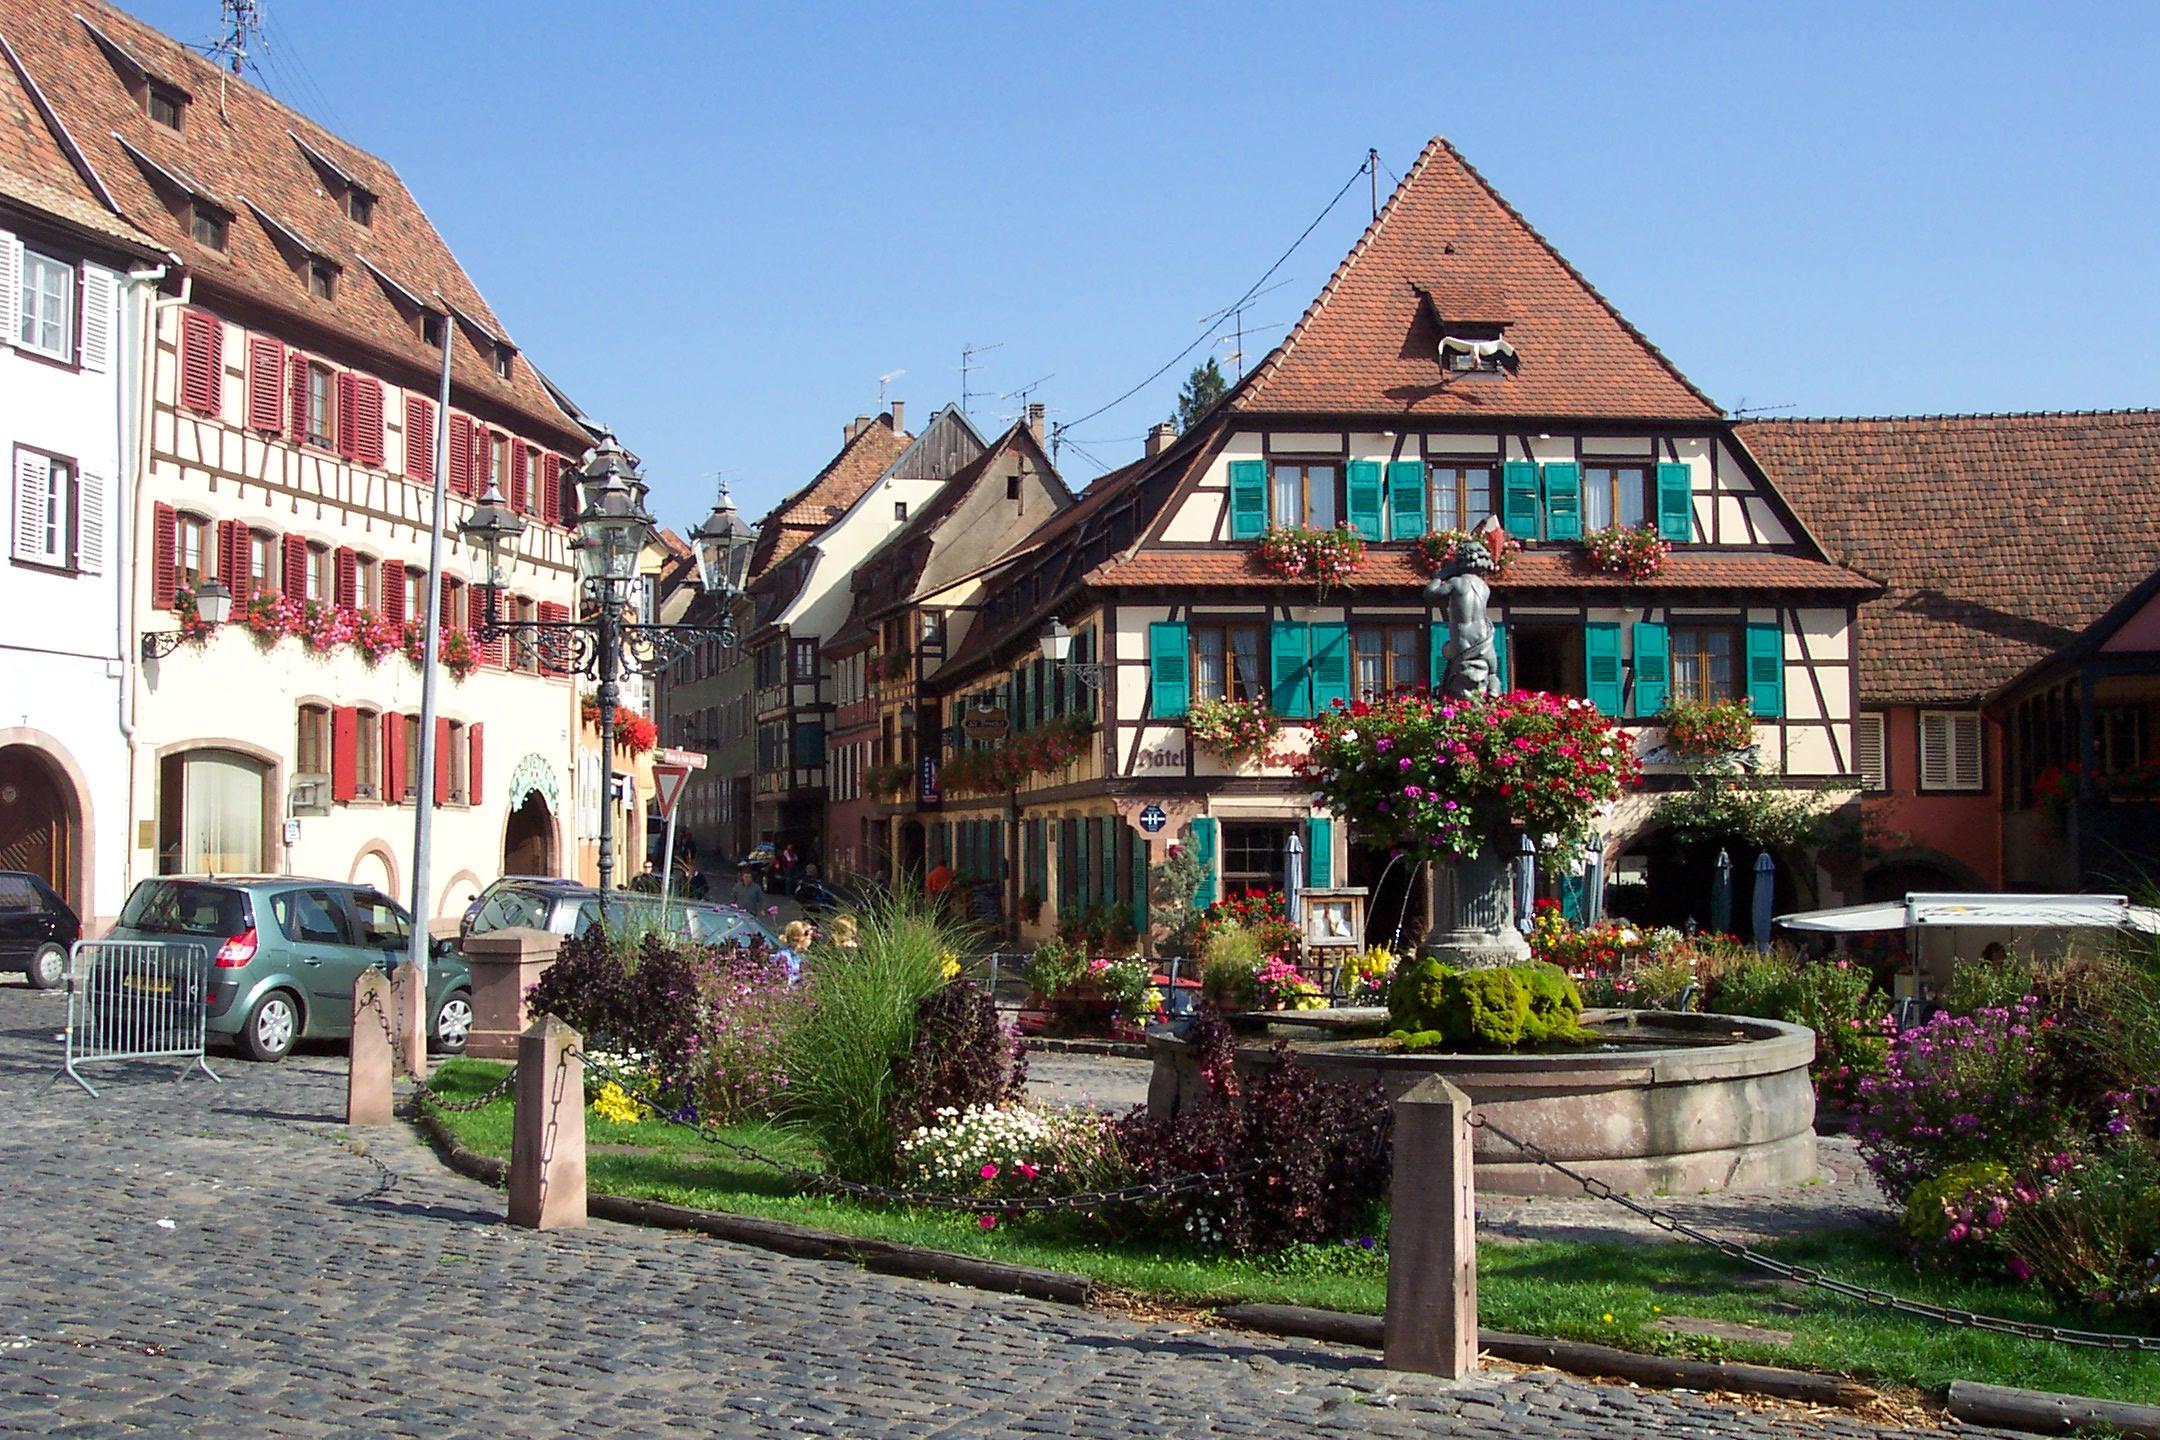 Obernai Hotel Restaurant Cheminee Faience Chat